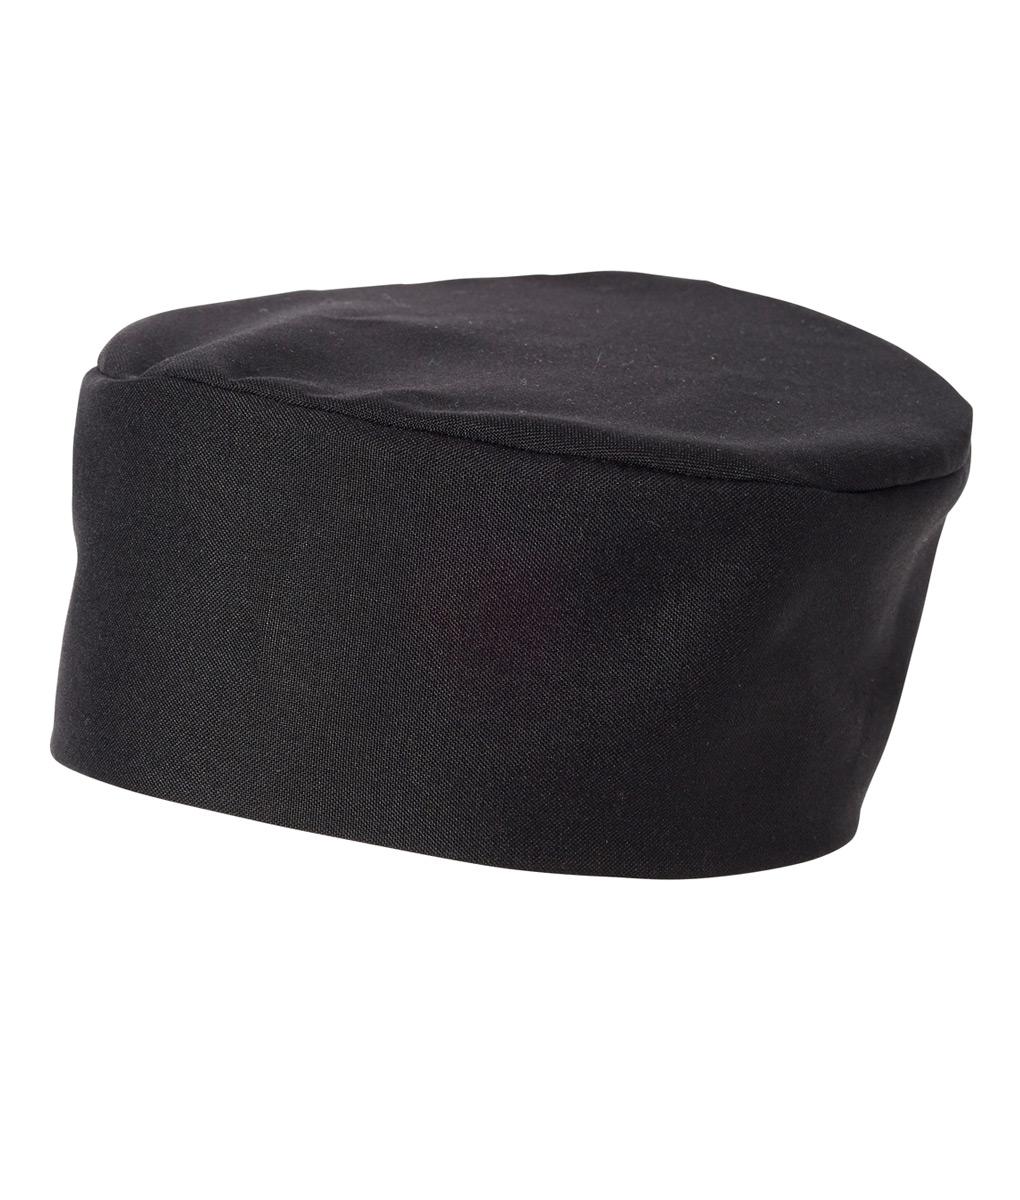 Traditional Flat Top Hat Black (Skull Cap / Pill Box) by Club Chef Chef Uniforms 2